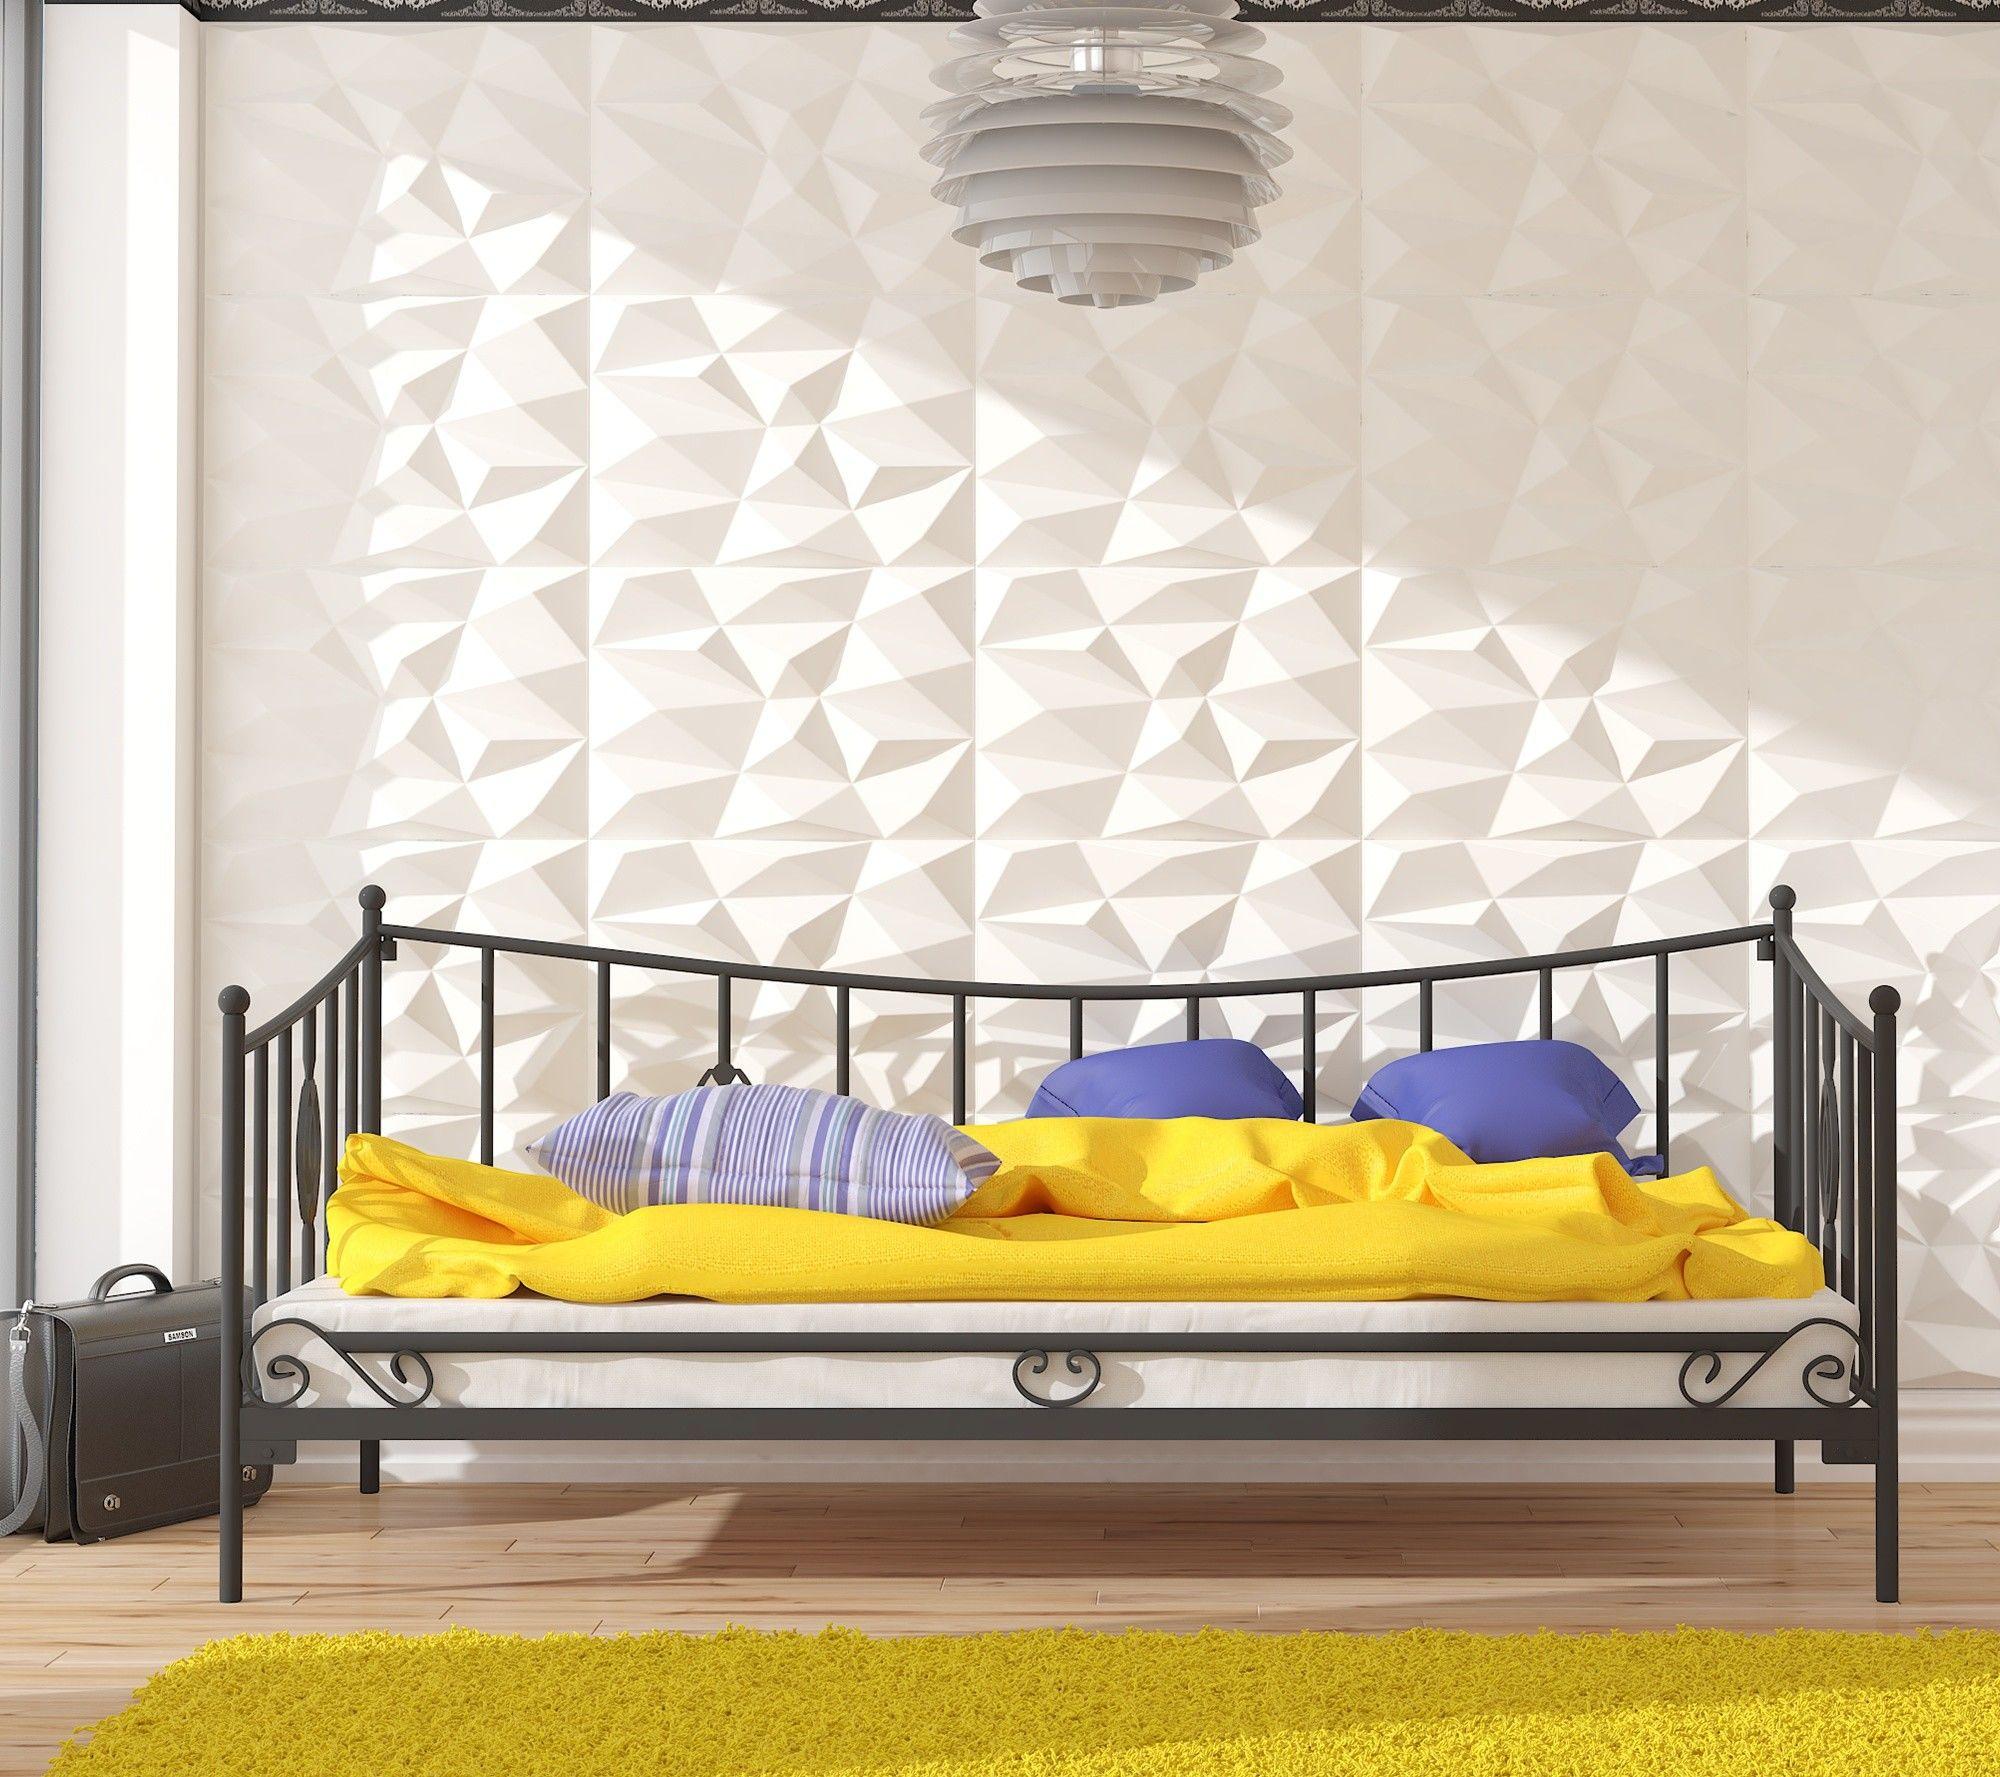 Łóżko metalowe sofa 90x190 wzór 31 ze stelażem